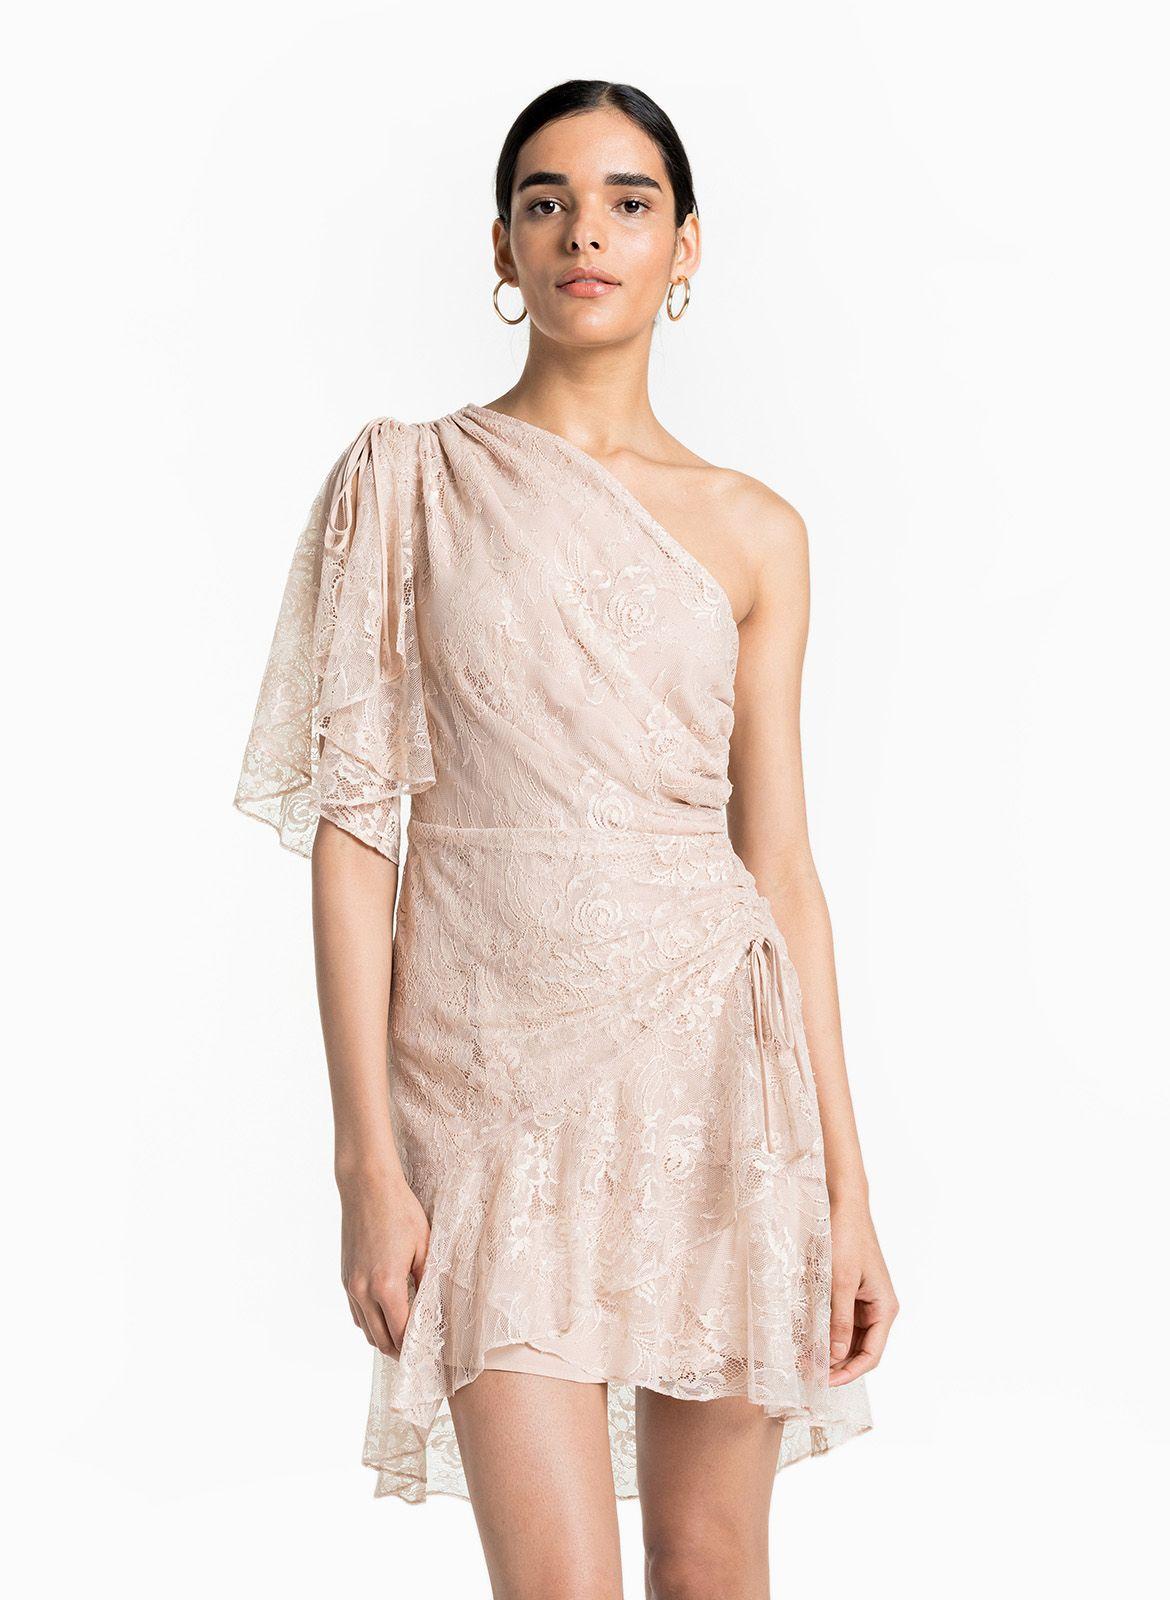 A L C Misha Dress Blush Pink One Shoulder Lace Dress Bridal Shower Engagement Party Rehearsal Dinner Dre Dresses Rehearsal Dinner Dresses Short Wedding Dress